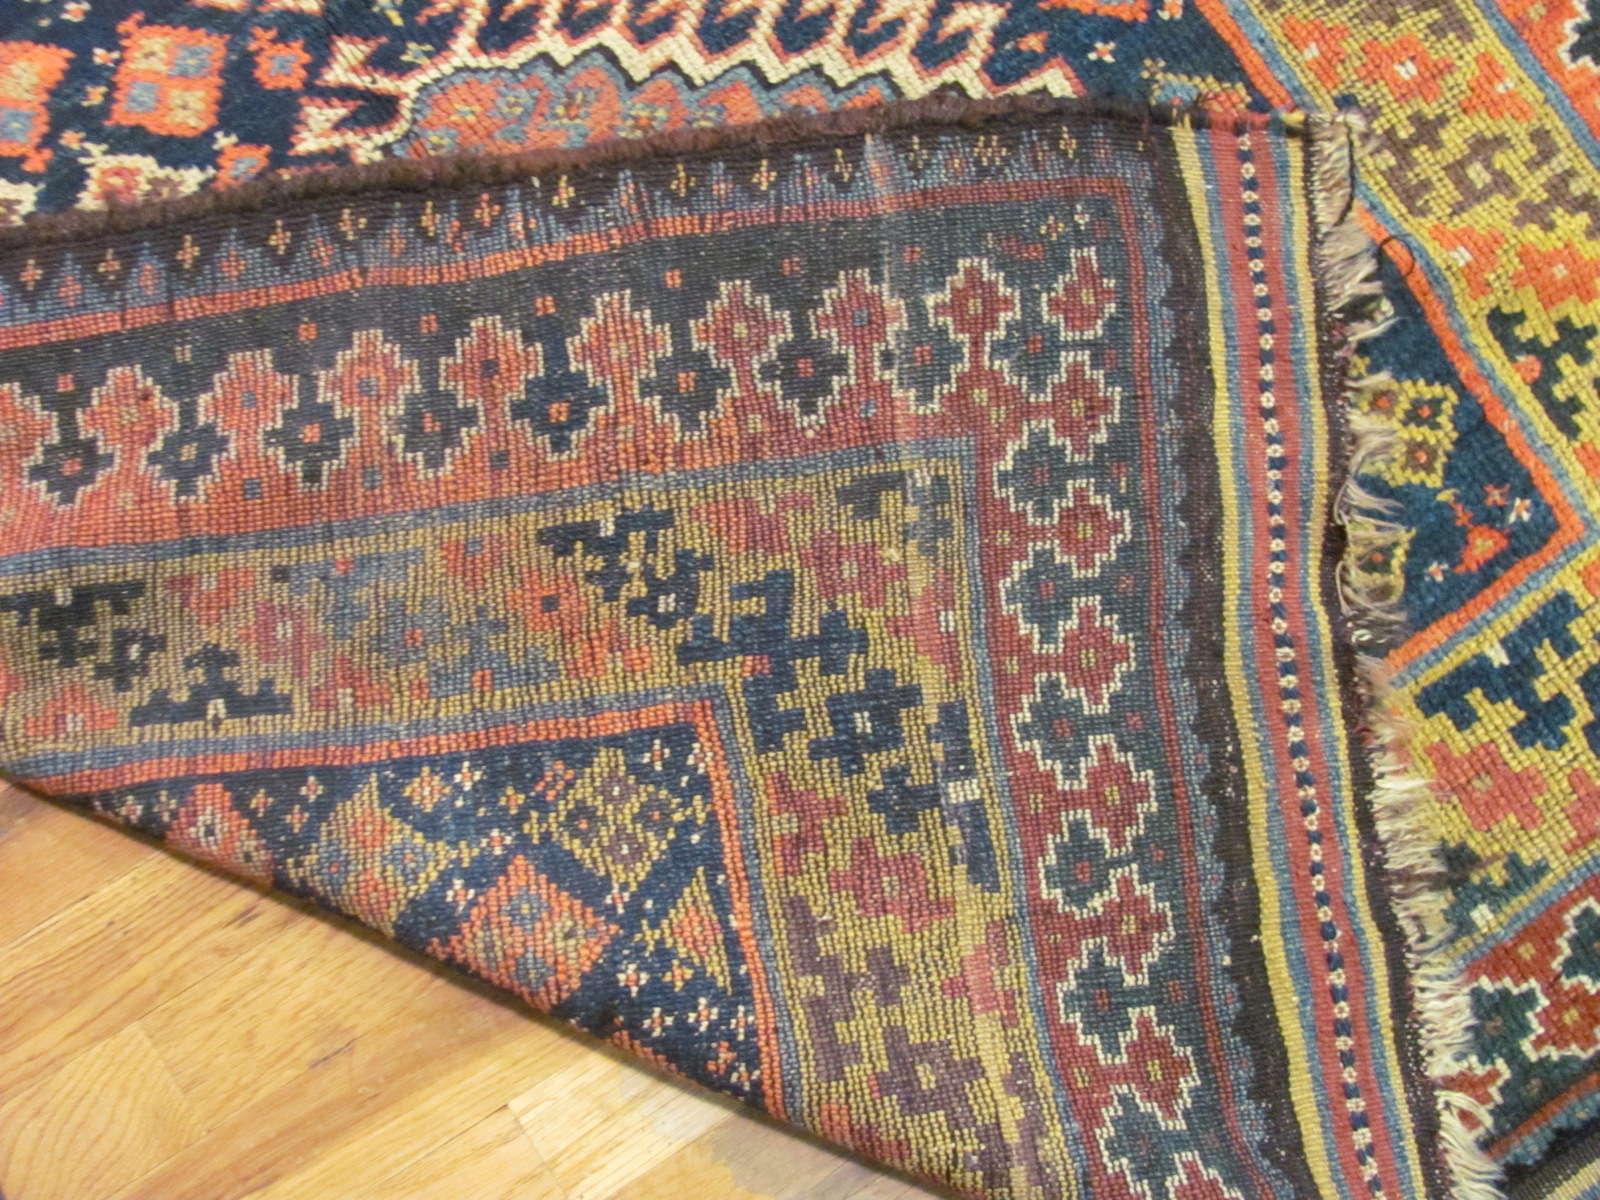 24544 antique persian kurd rug 4x7,9 -3